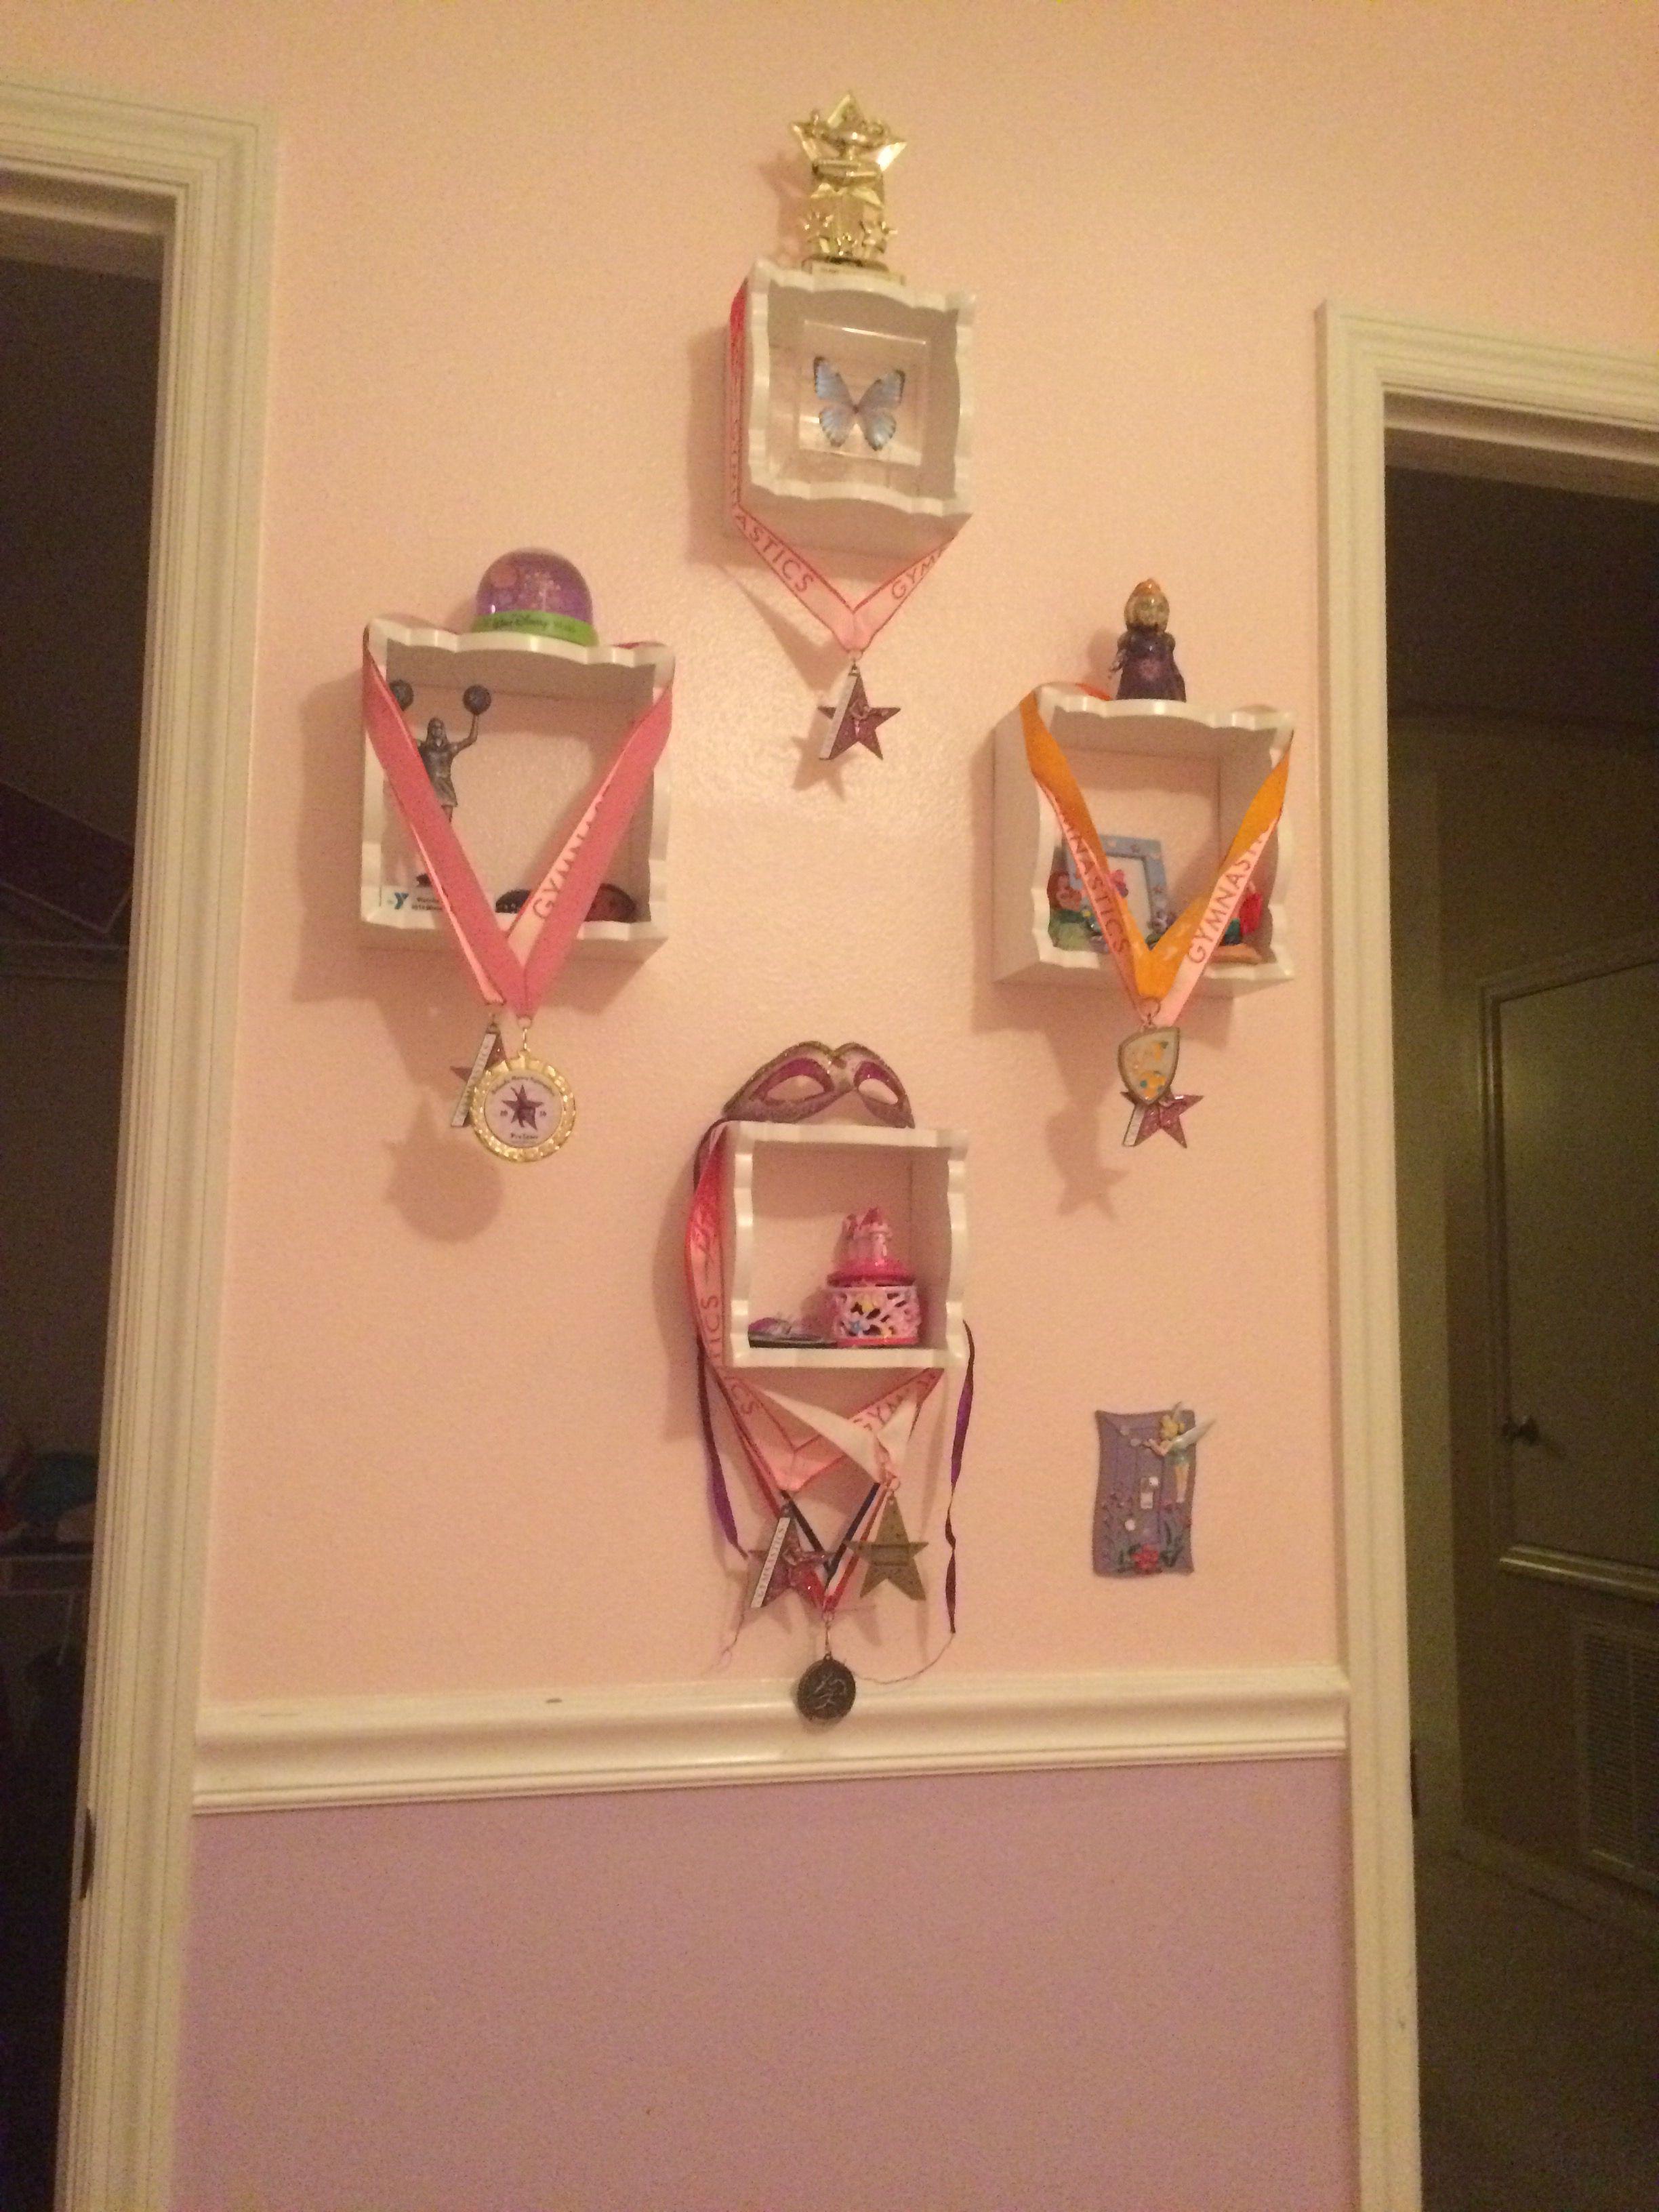 Cool Trophy Wall Idea